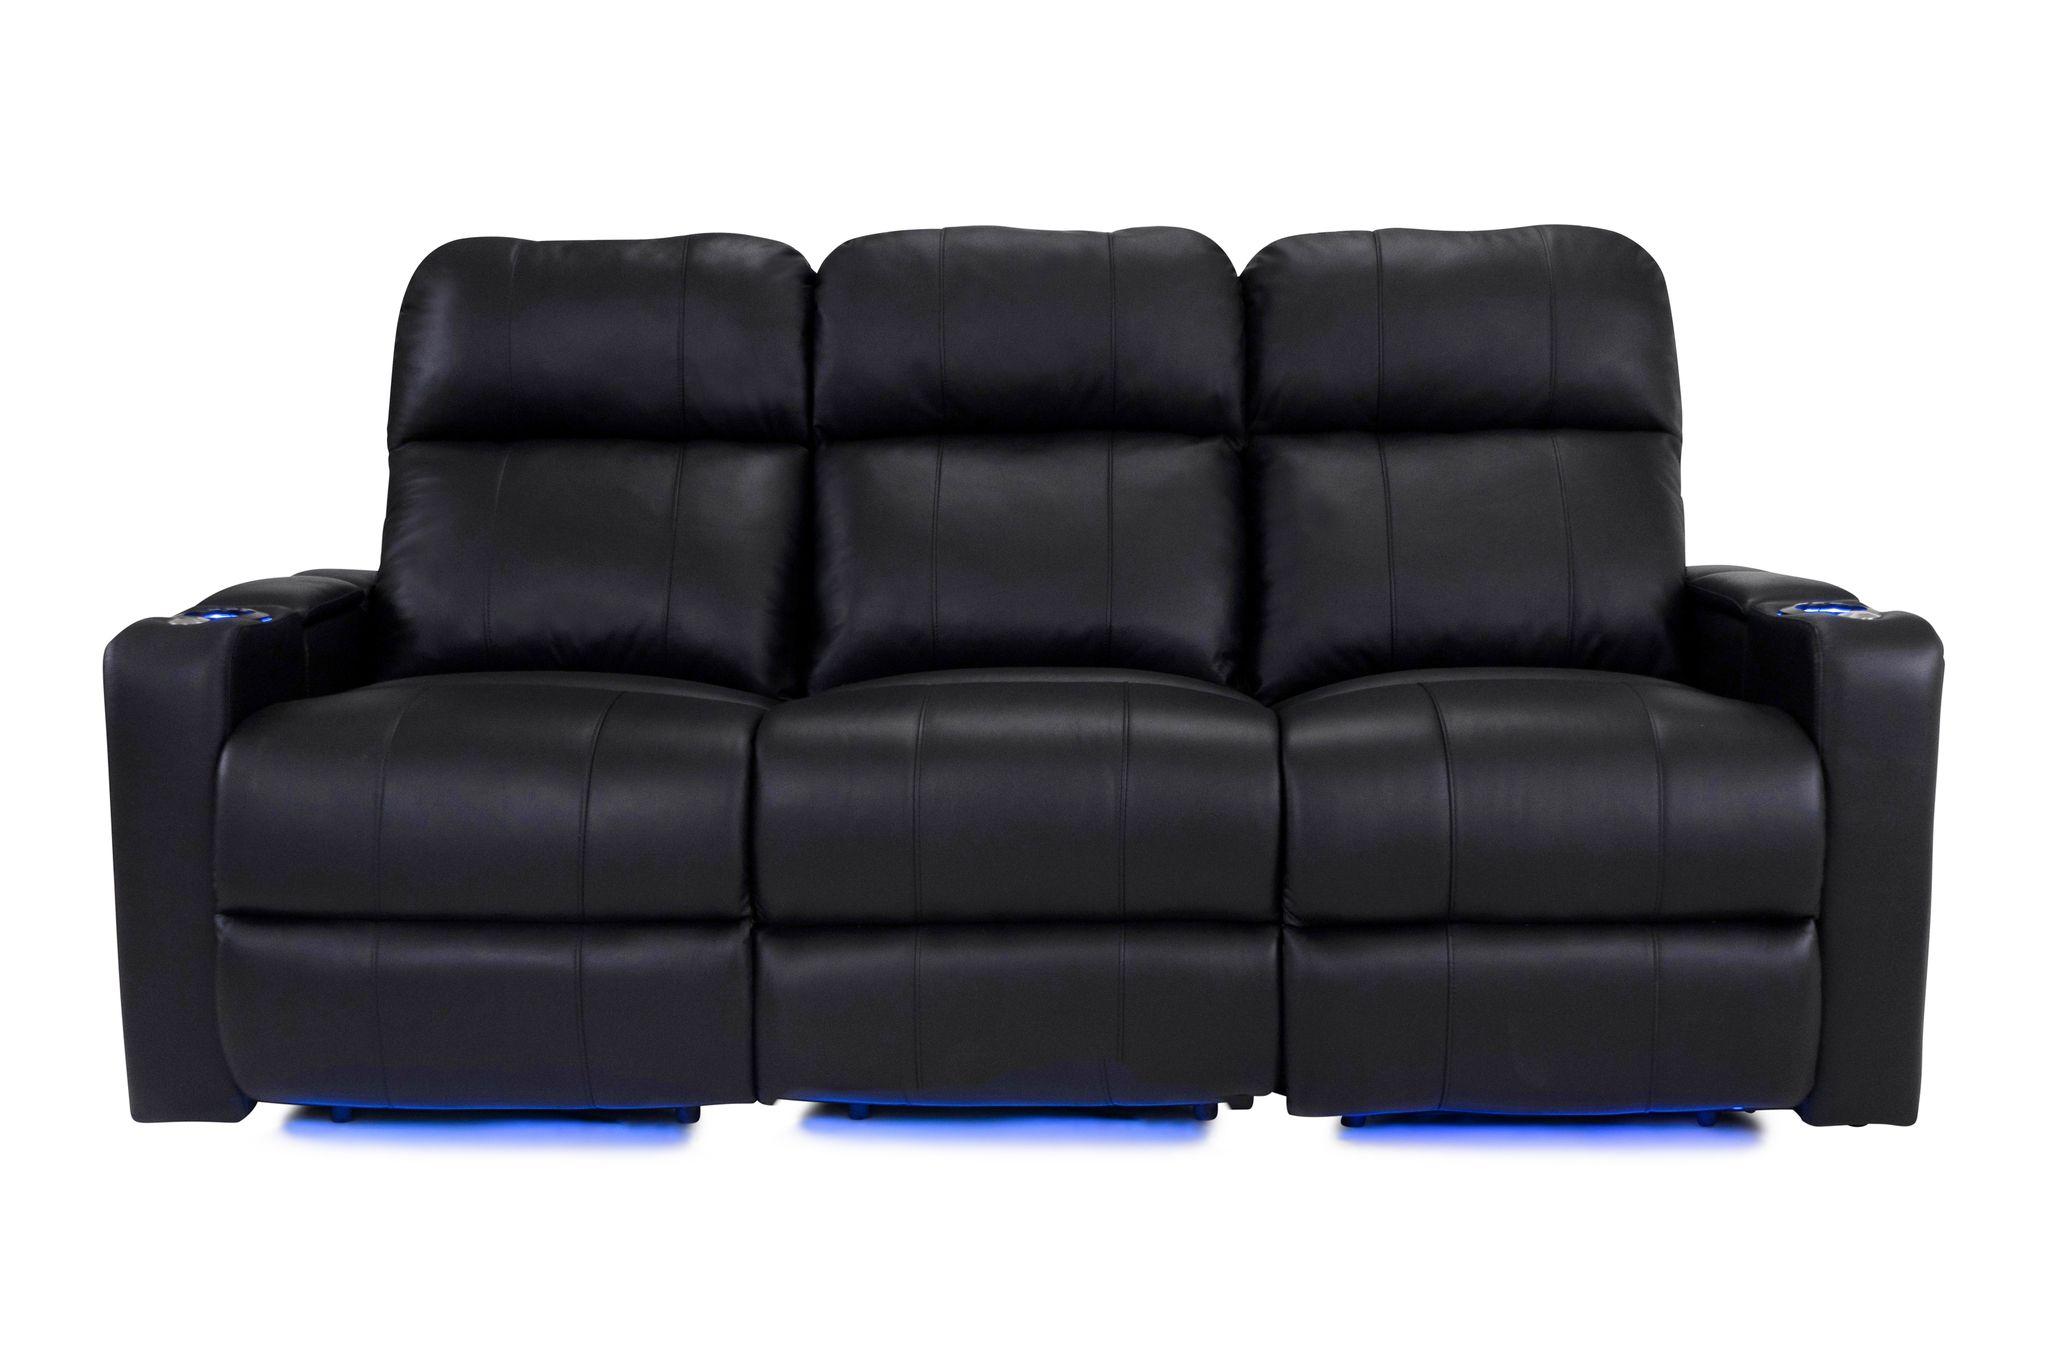 RowOne Prestige Seating Coach